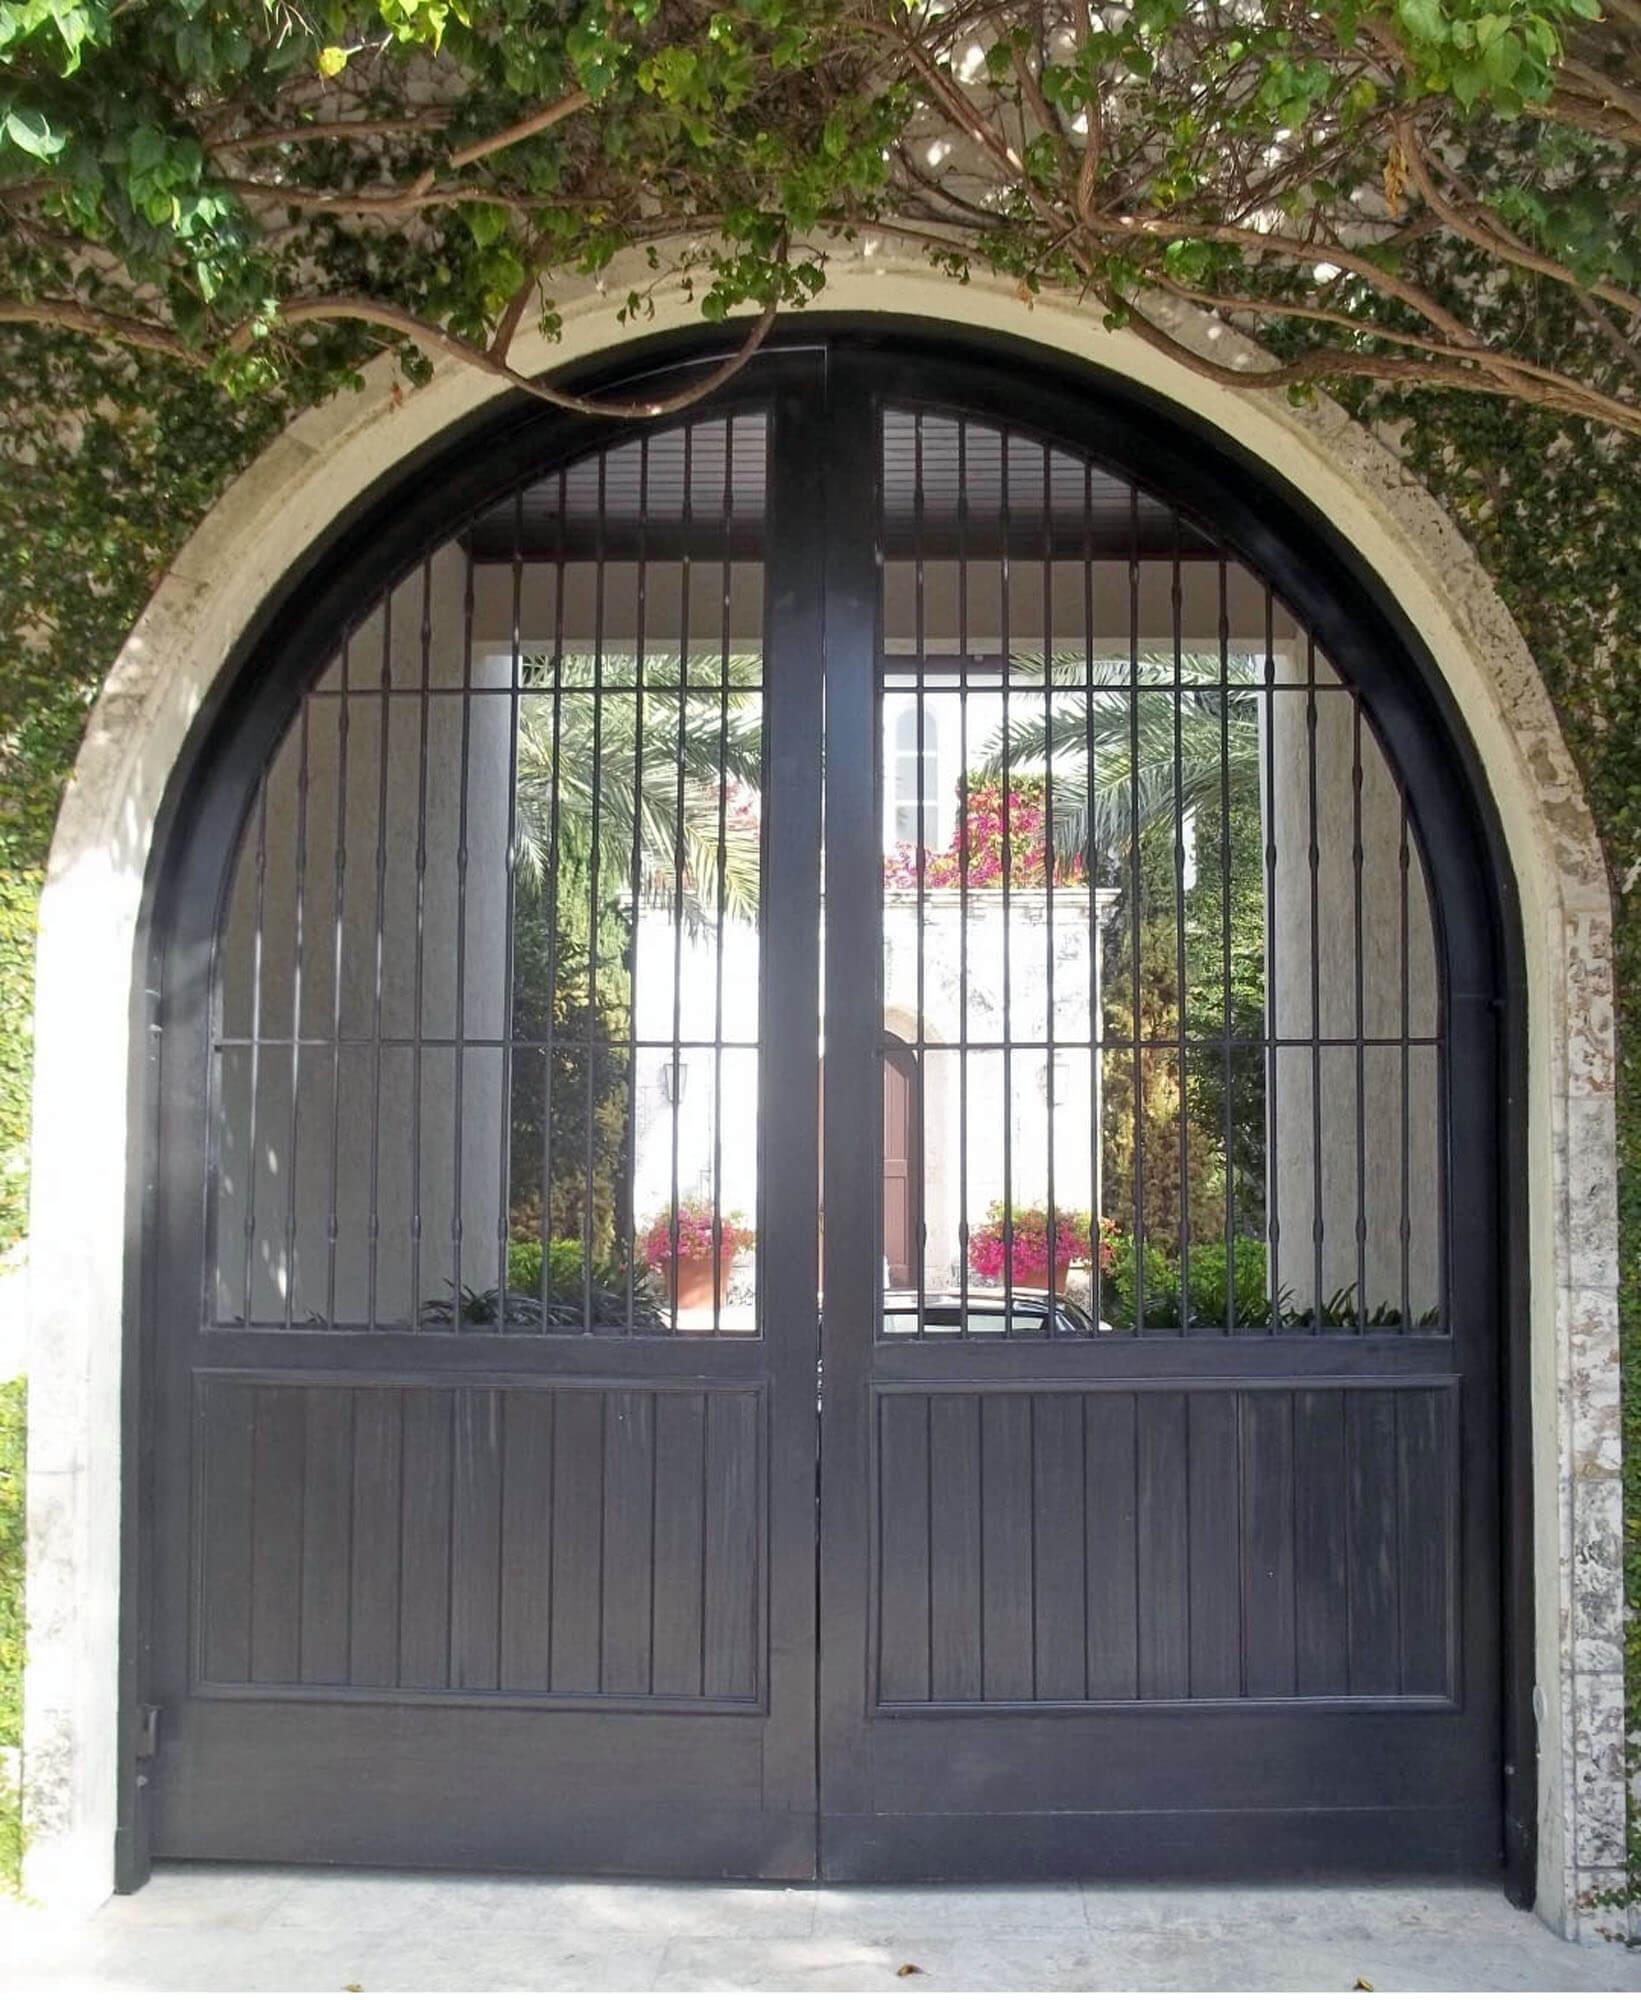 SUNSET ISLAND MAHOGANY GATE DOOR.